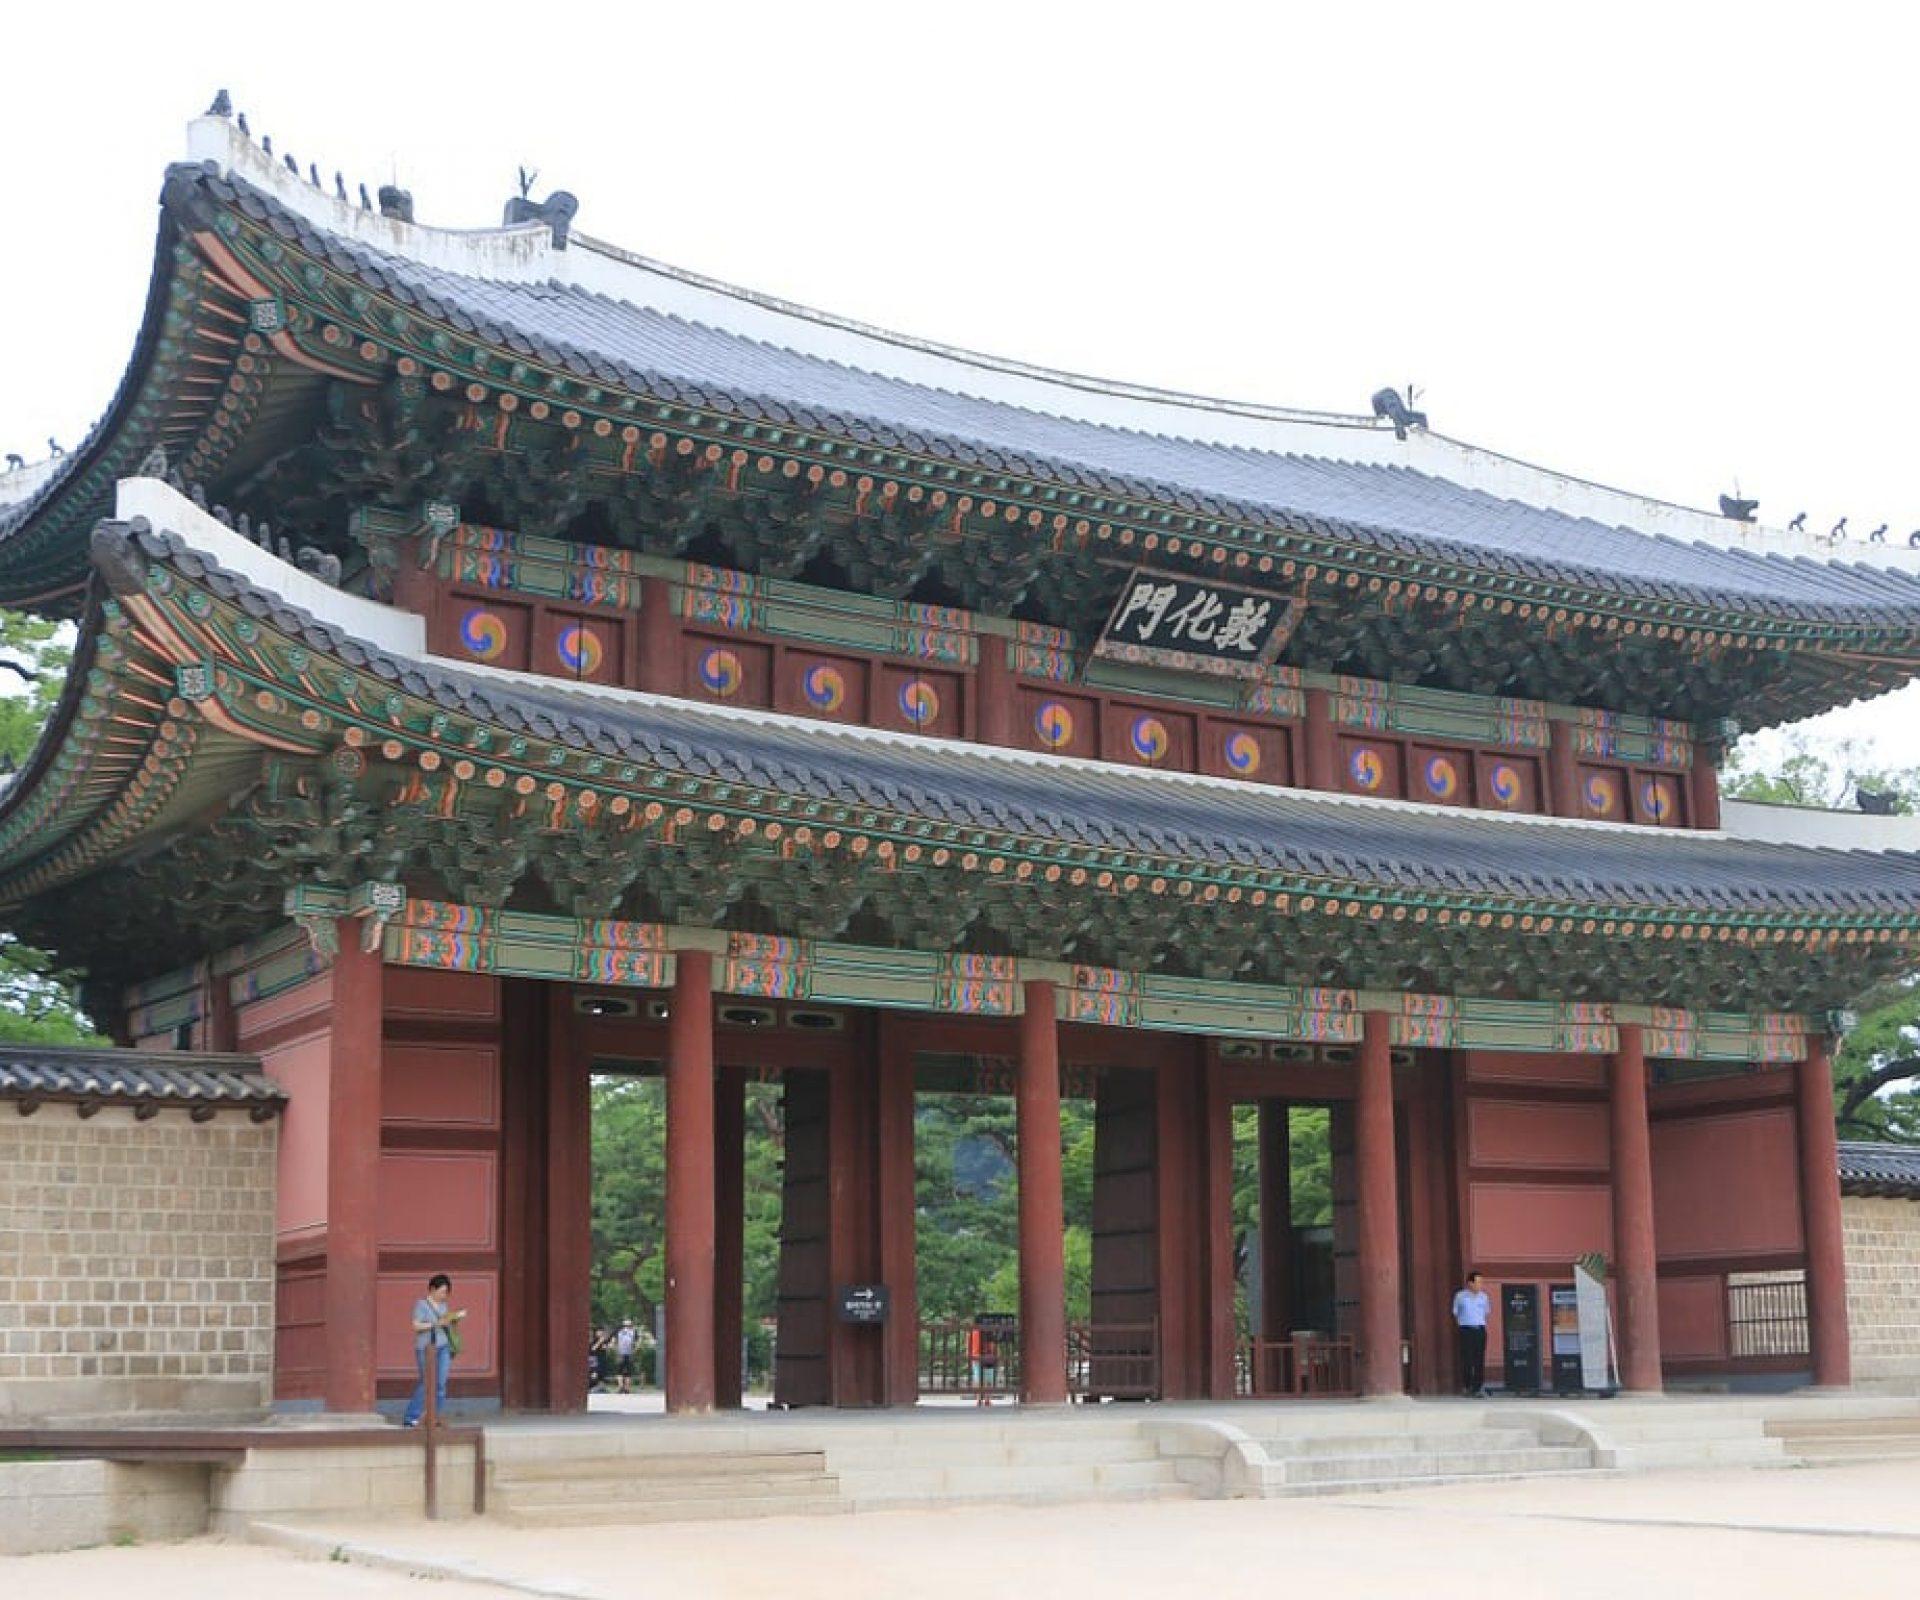 Changdeokgung Palace | Jongno-gu, Seoul